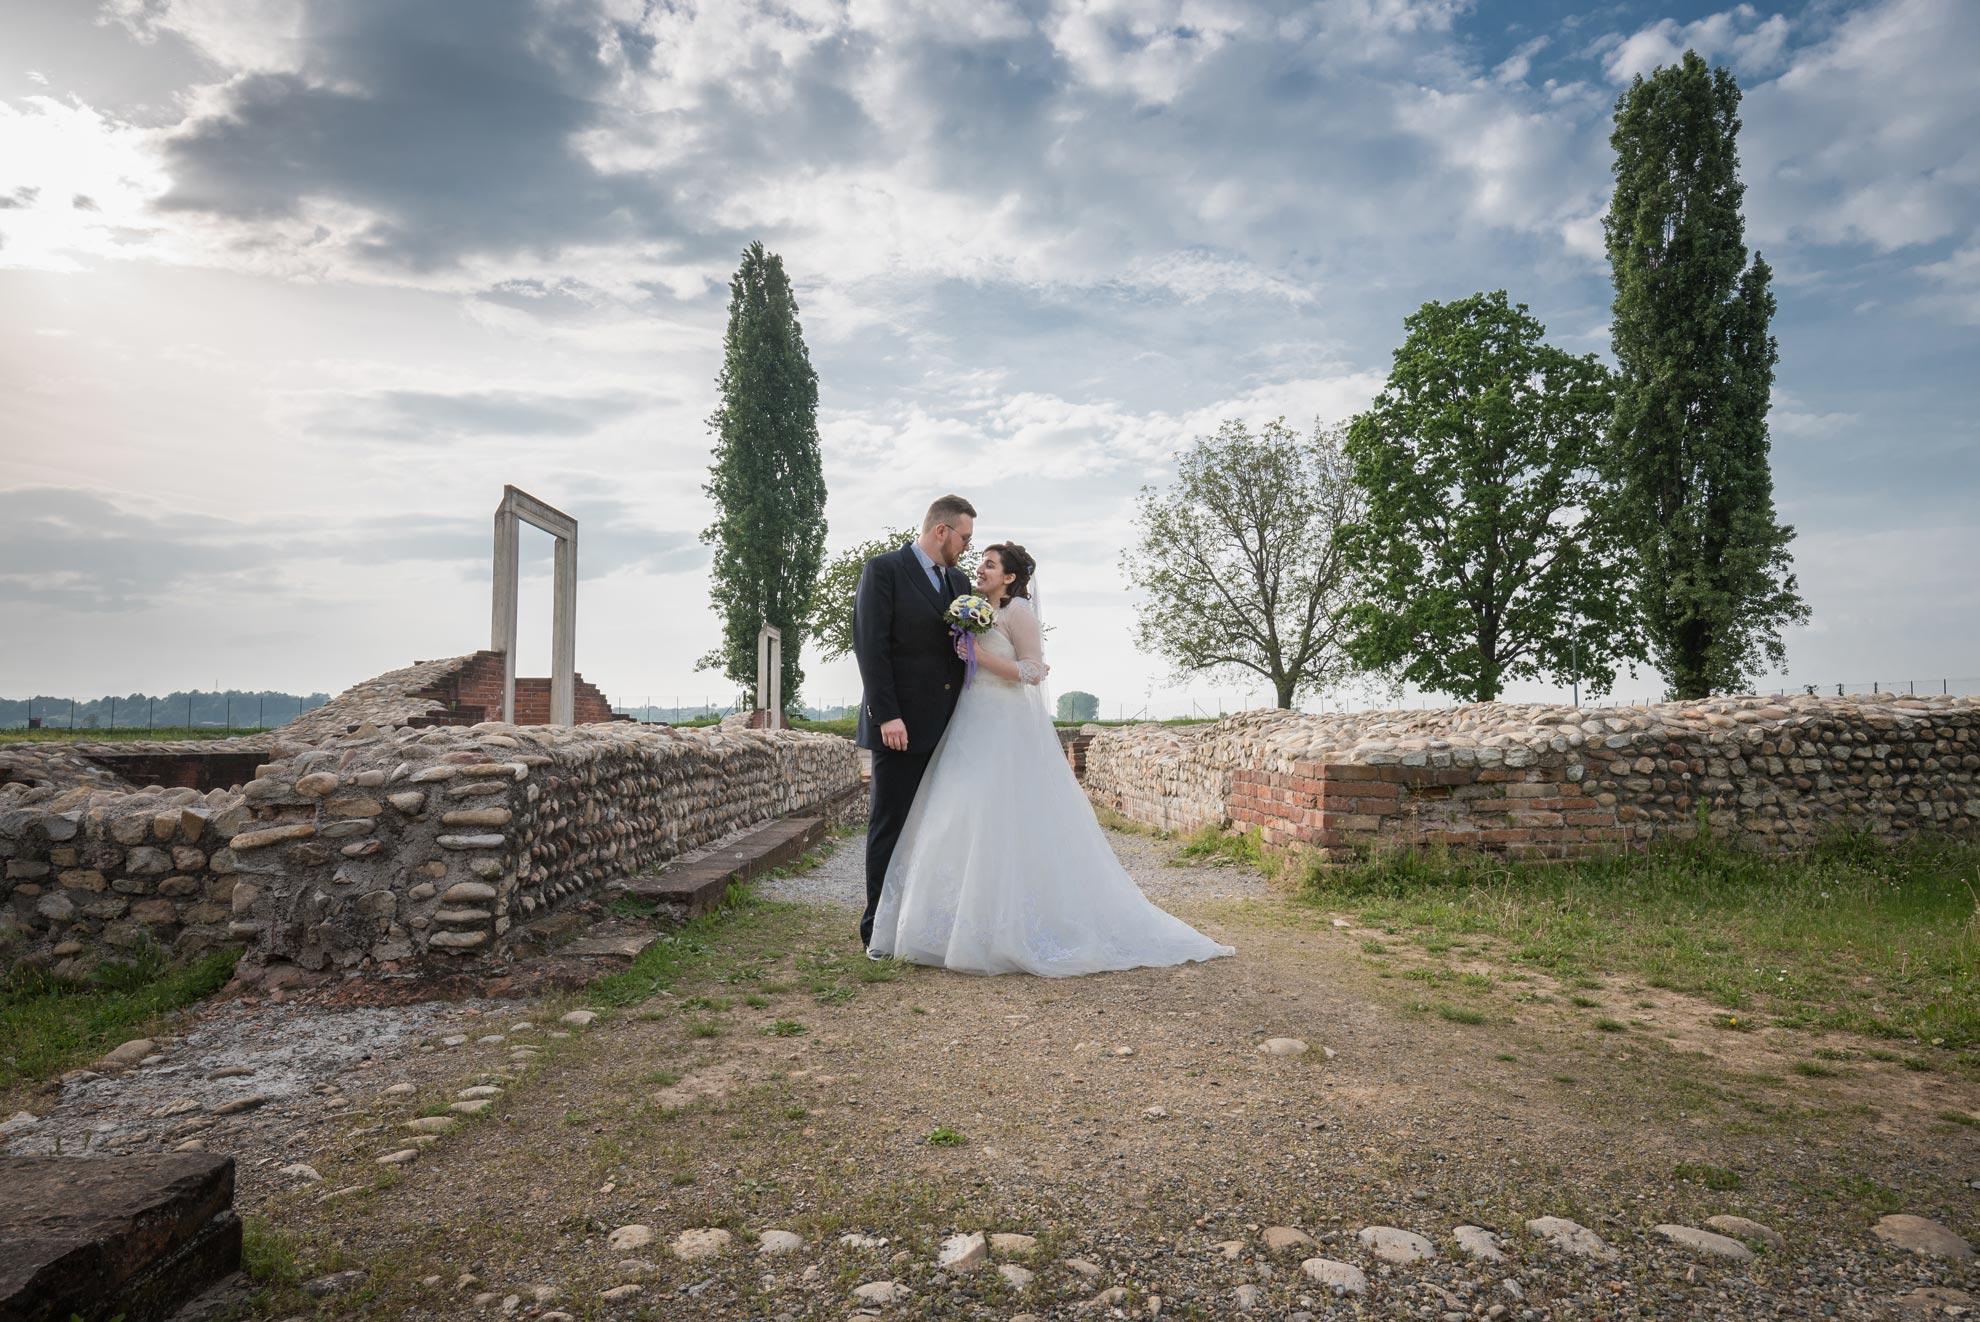 Matrimonio a Narzole Lorenza Diego - DSC 0663 - Fotografie matrimonio aritstiche - Fotografie matrimonio aritstiche